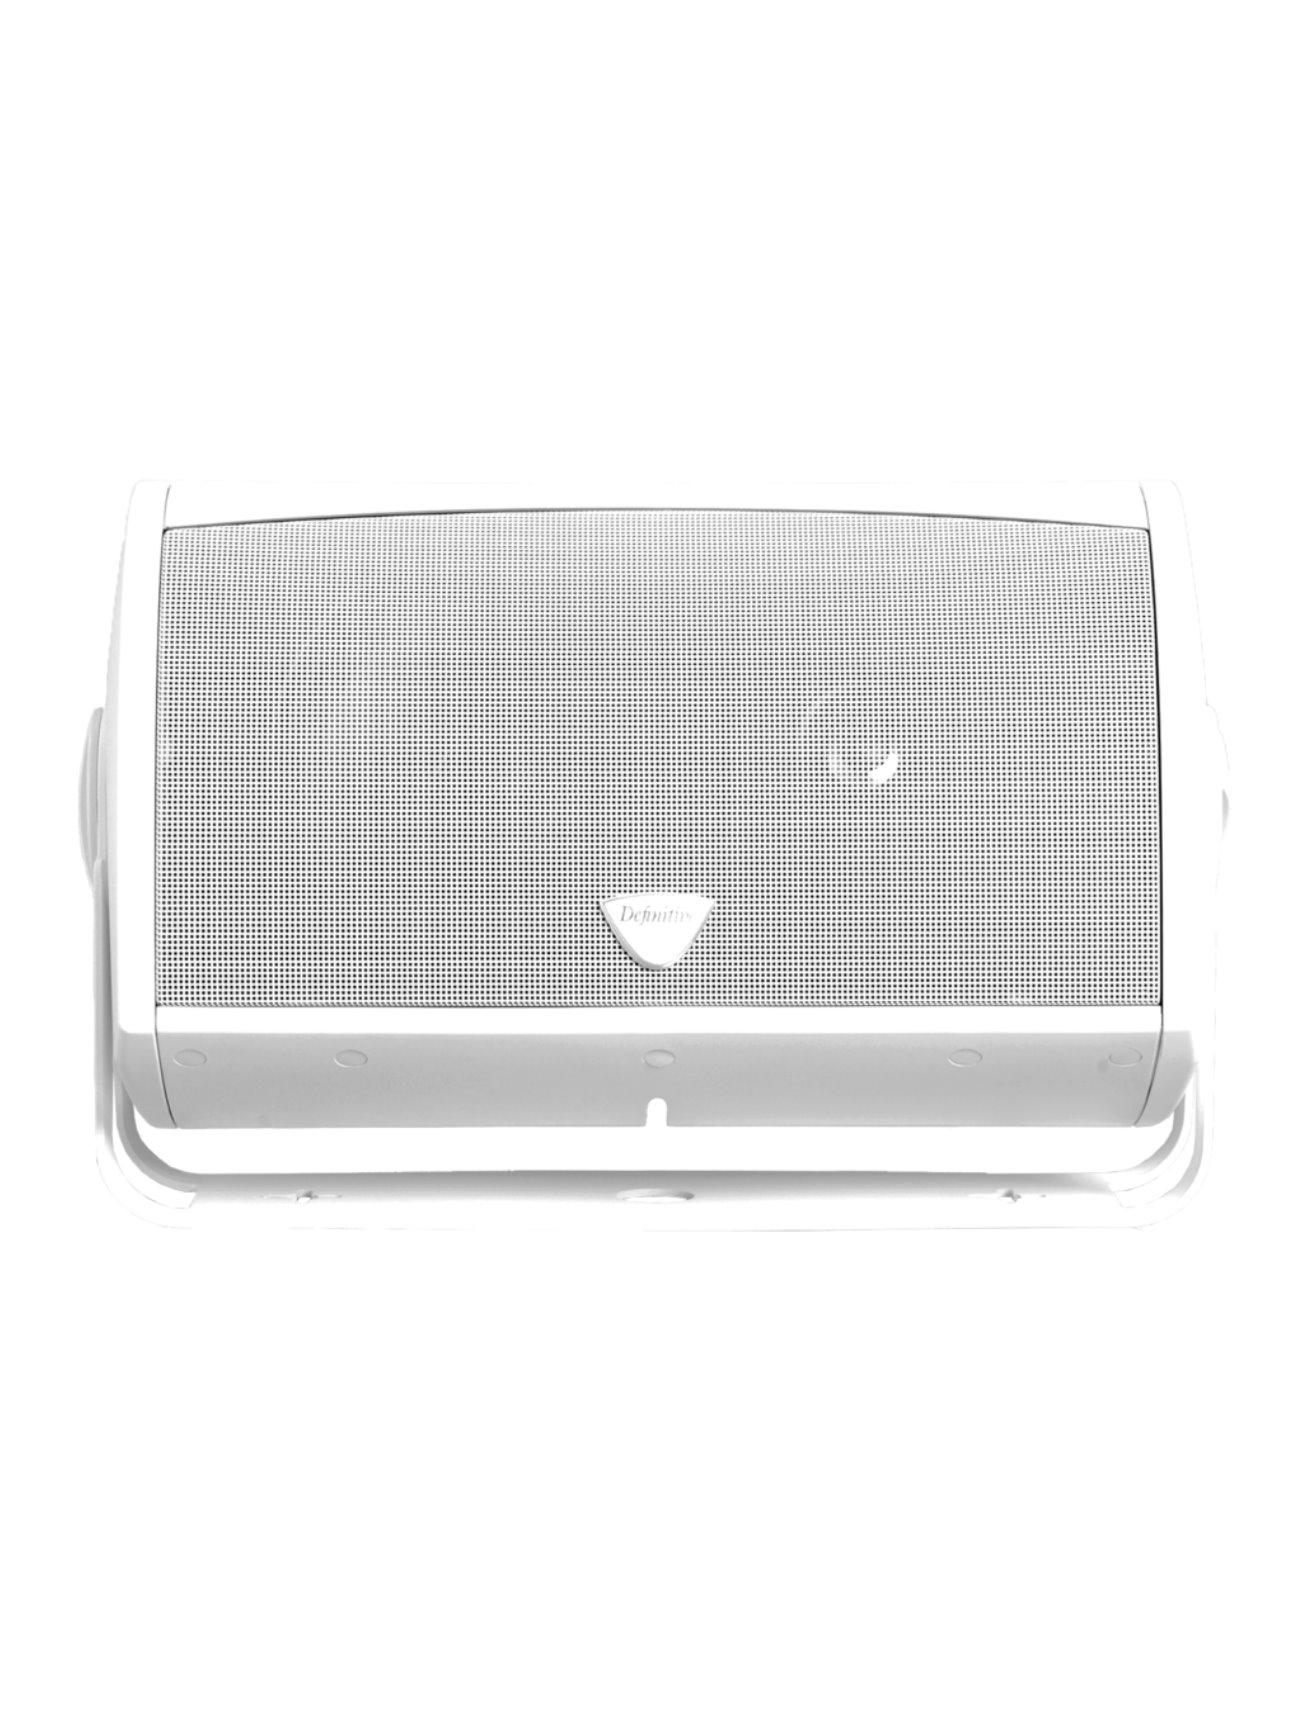 Definitive Technology AW6500 Ηχείο Εξωτερικού Χώρου 6.5″ 8Ω 200W